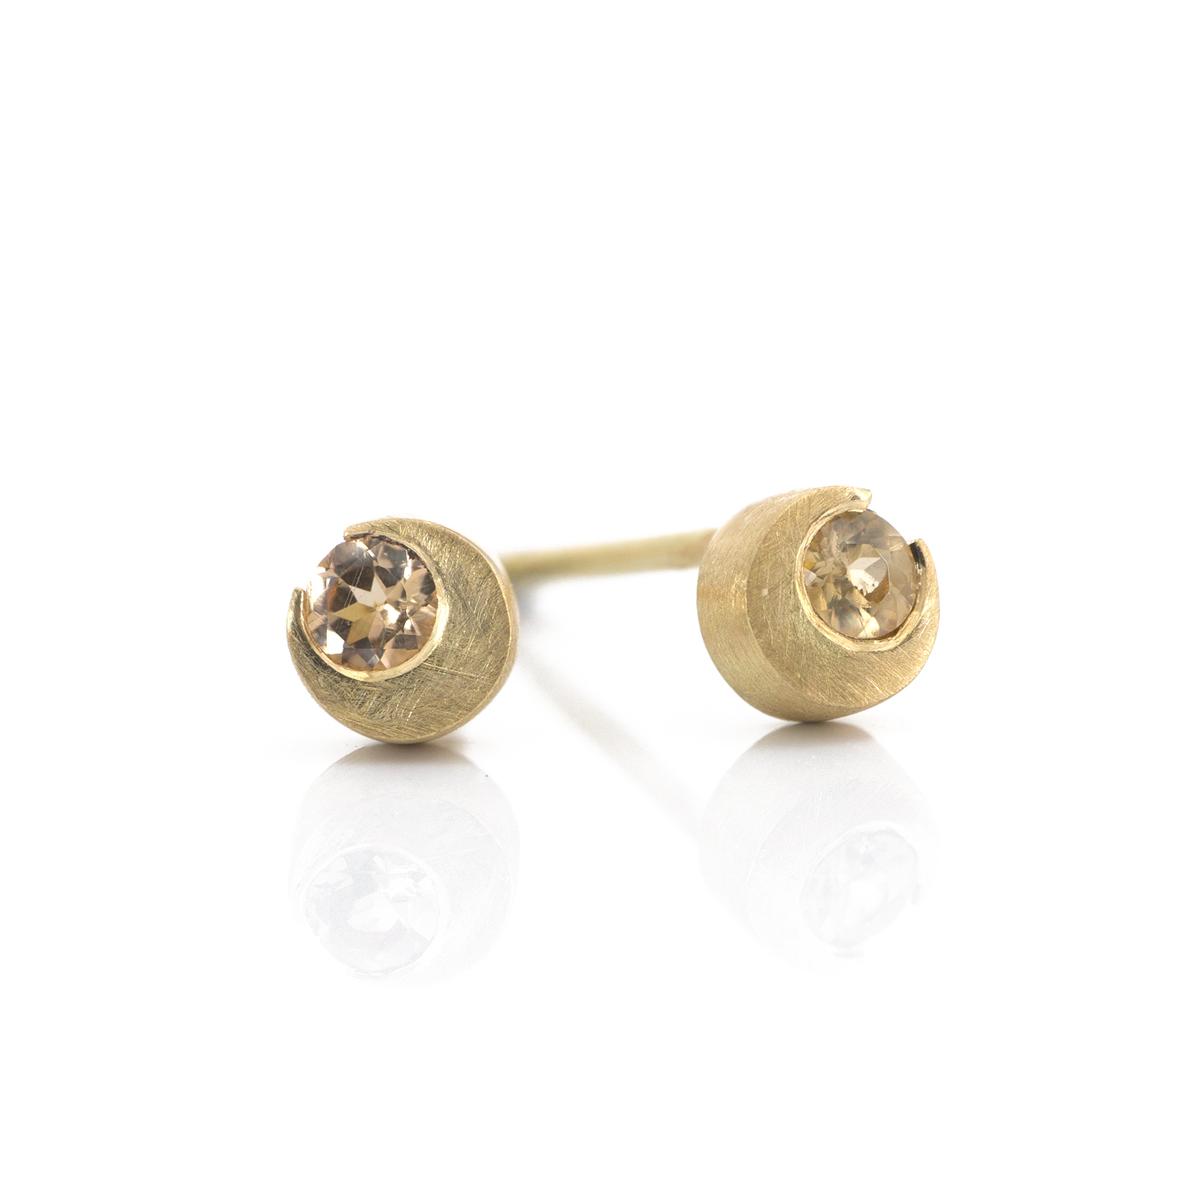 18k yellow gold× imperial Topaz, moonlight earrings